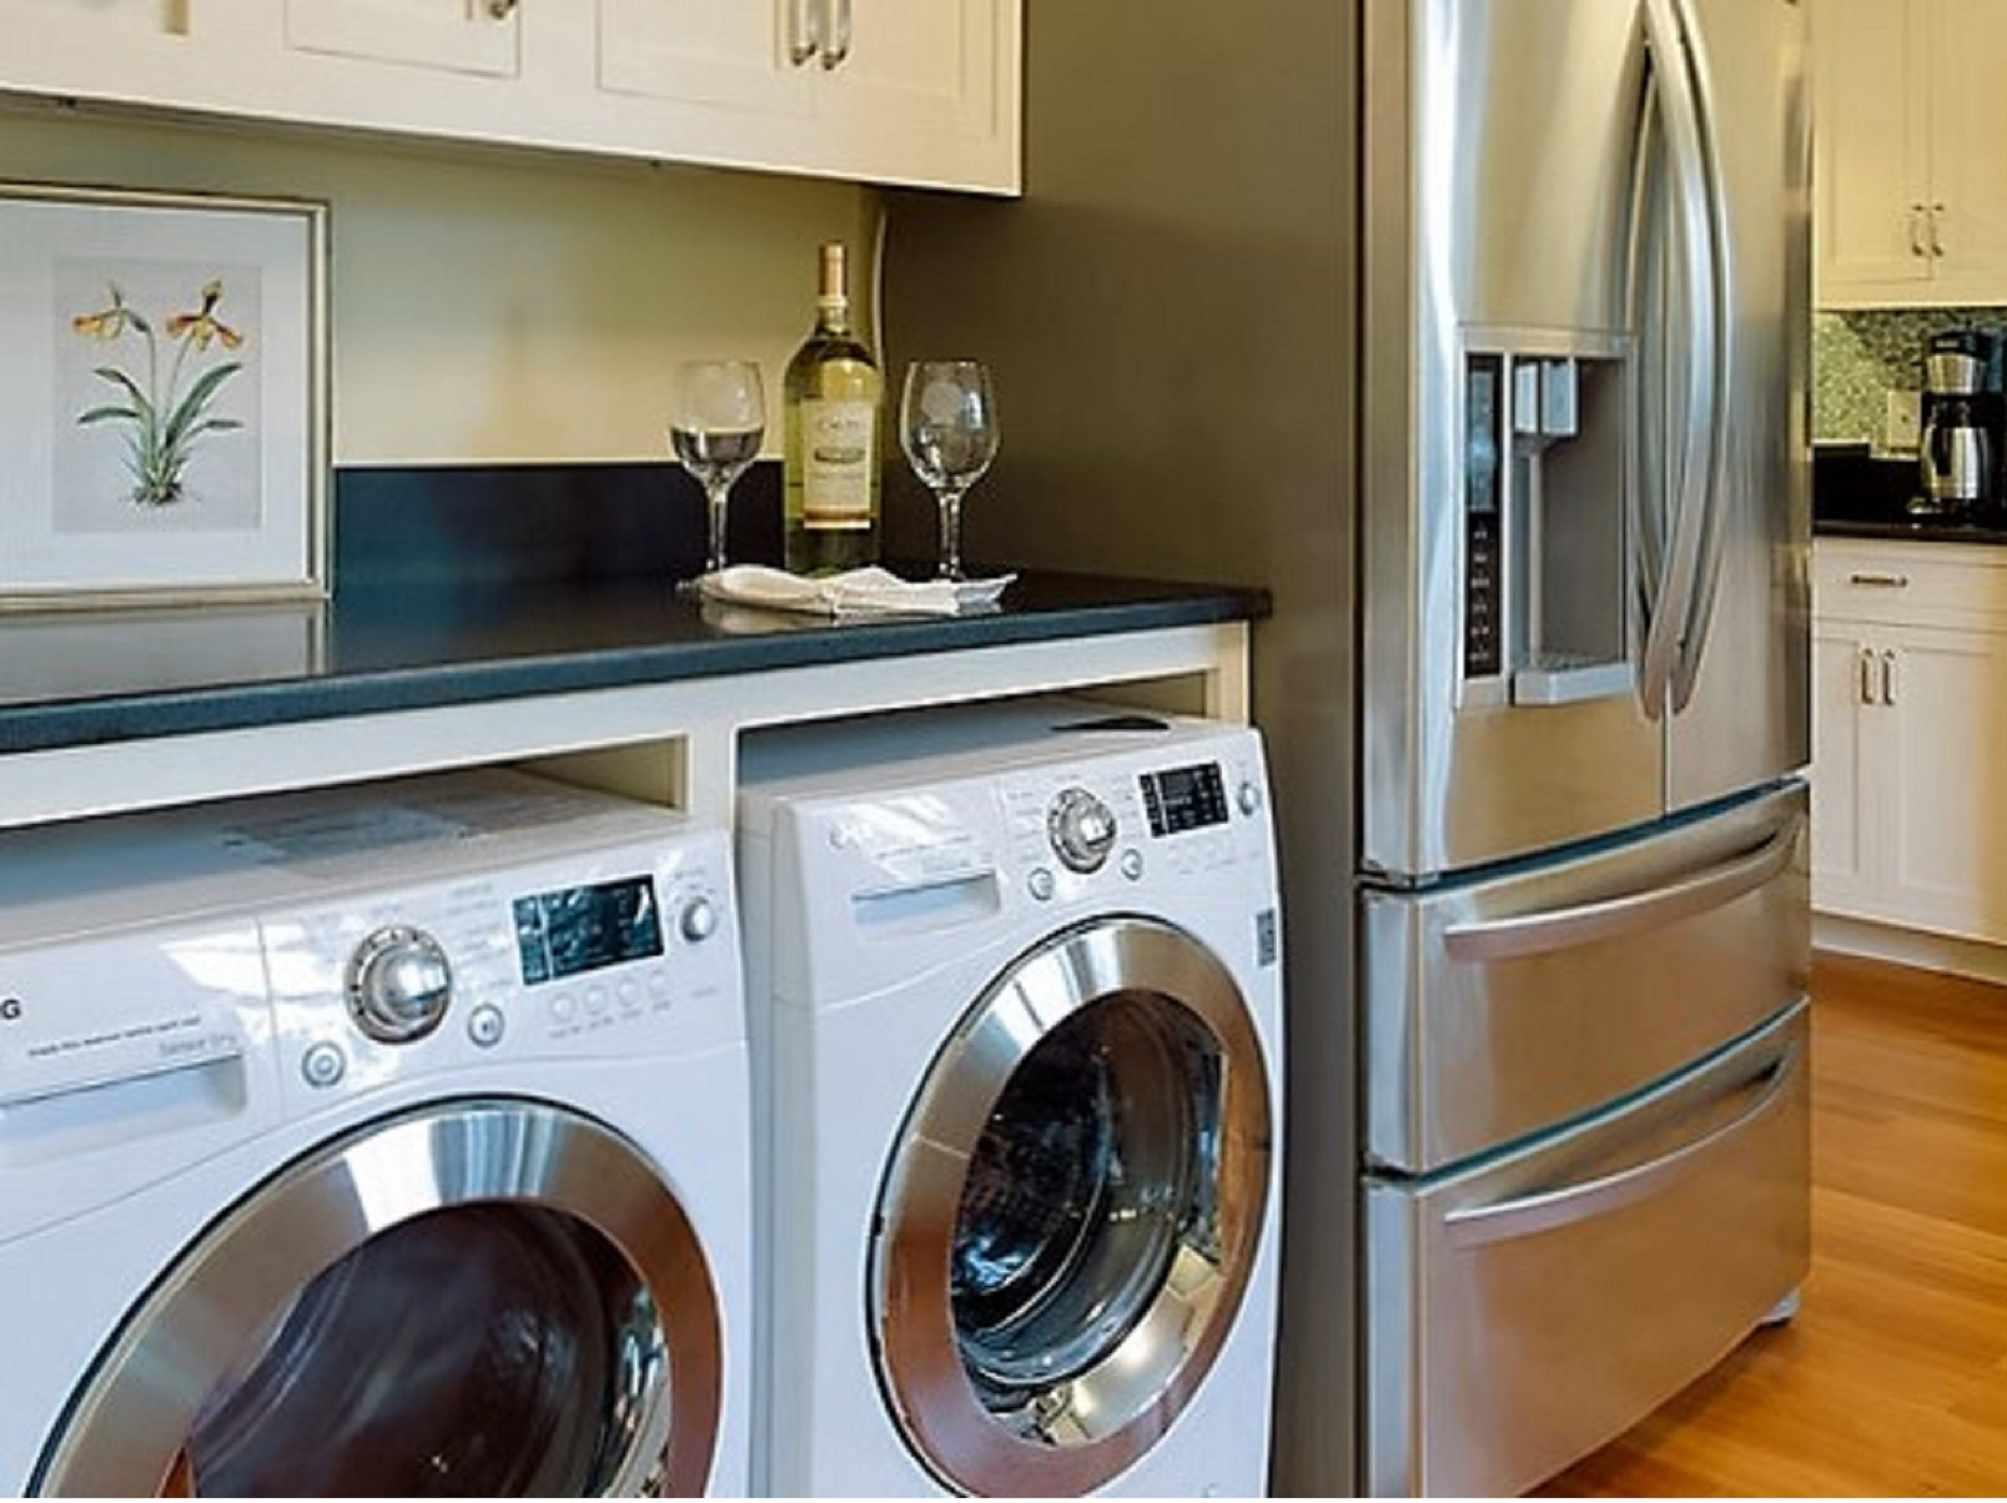 Vacation Kitchen Laundry BIG